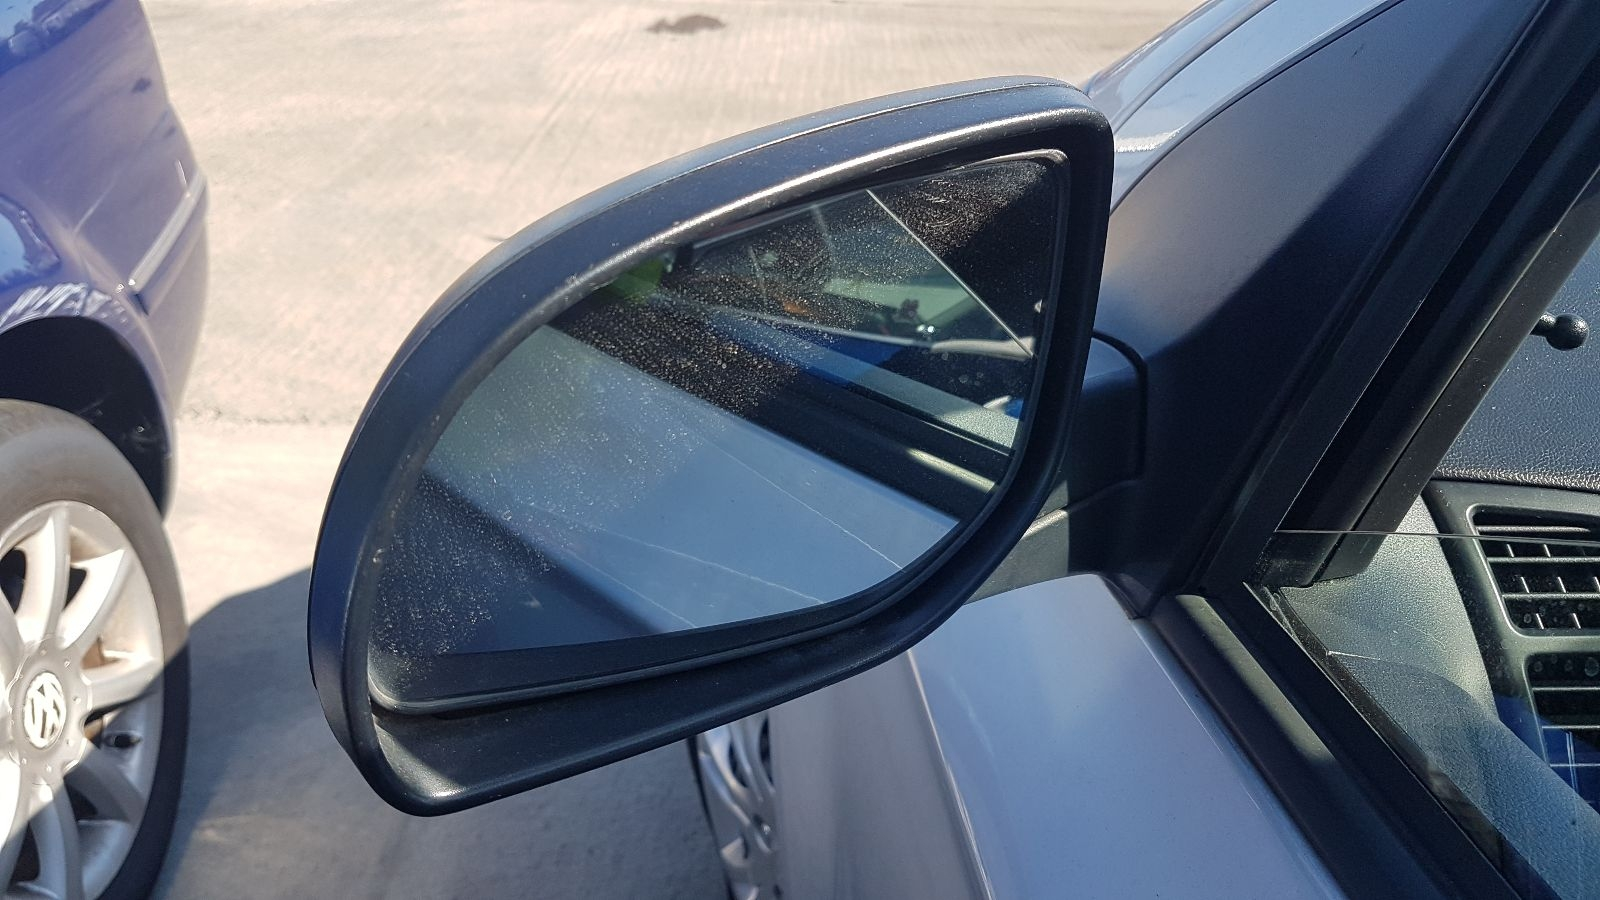 View Auto part L Door Mirror Hyundai I20 2009